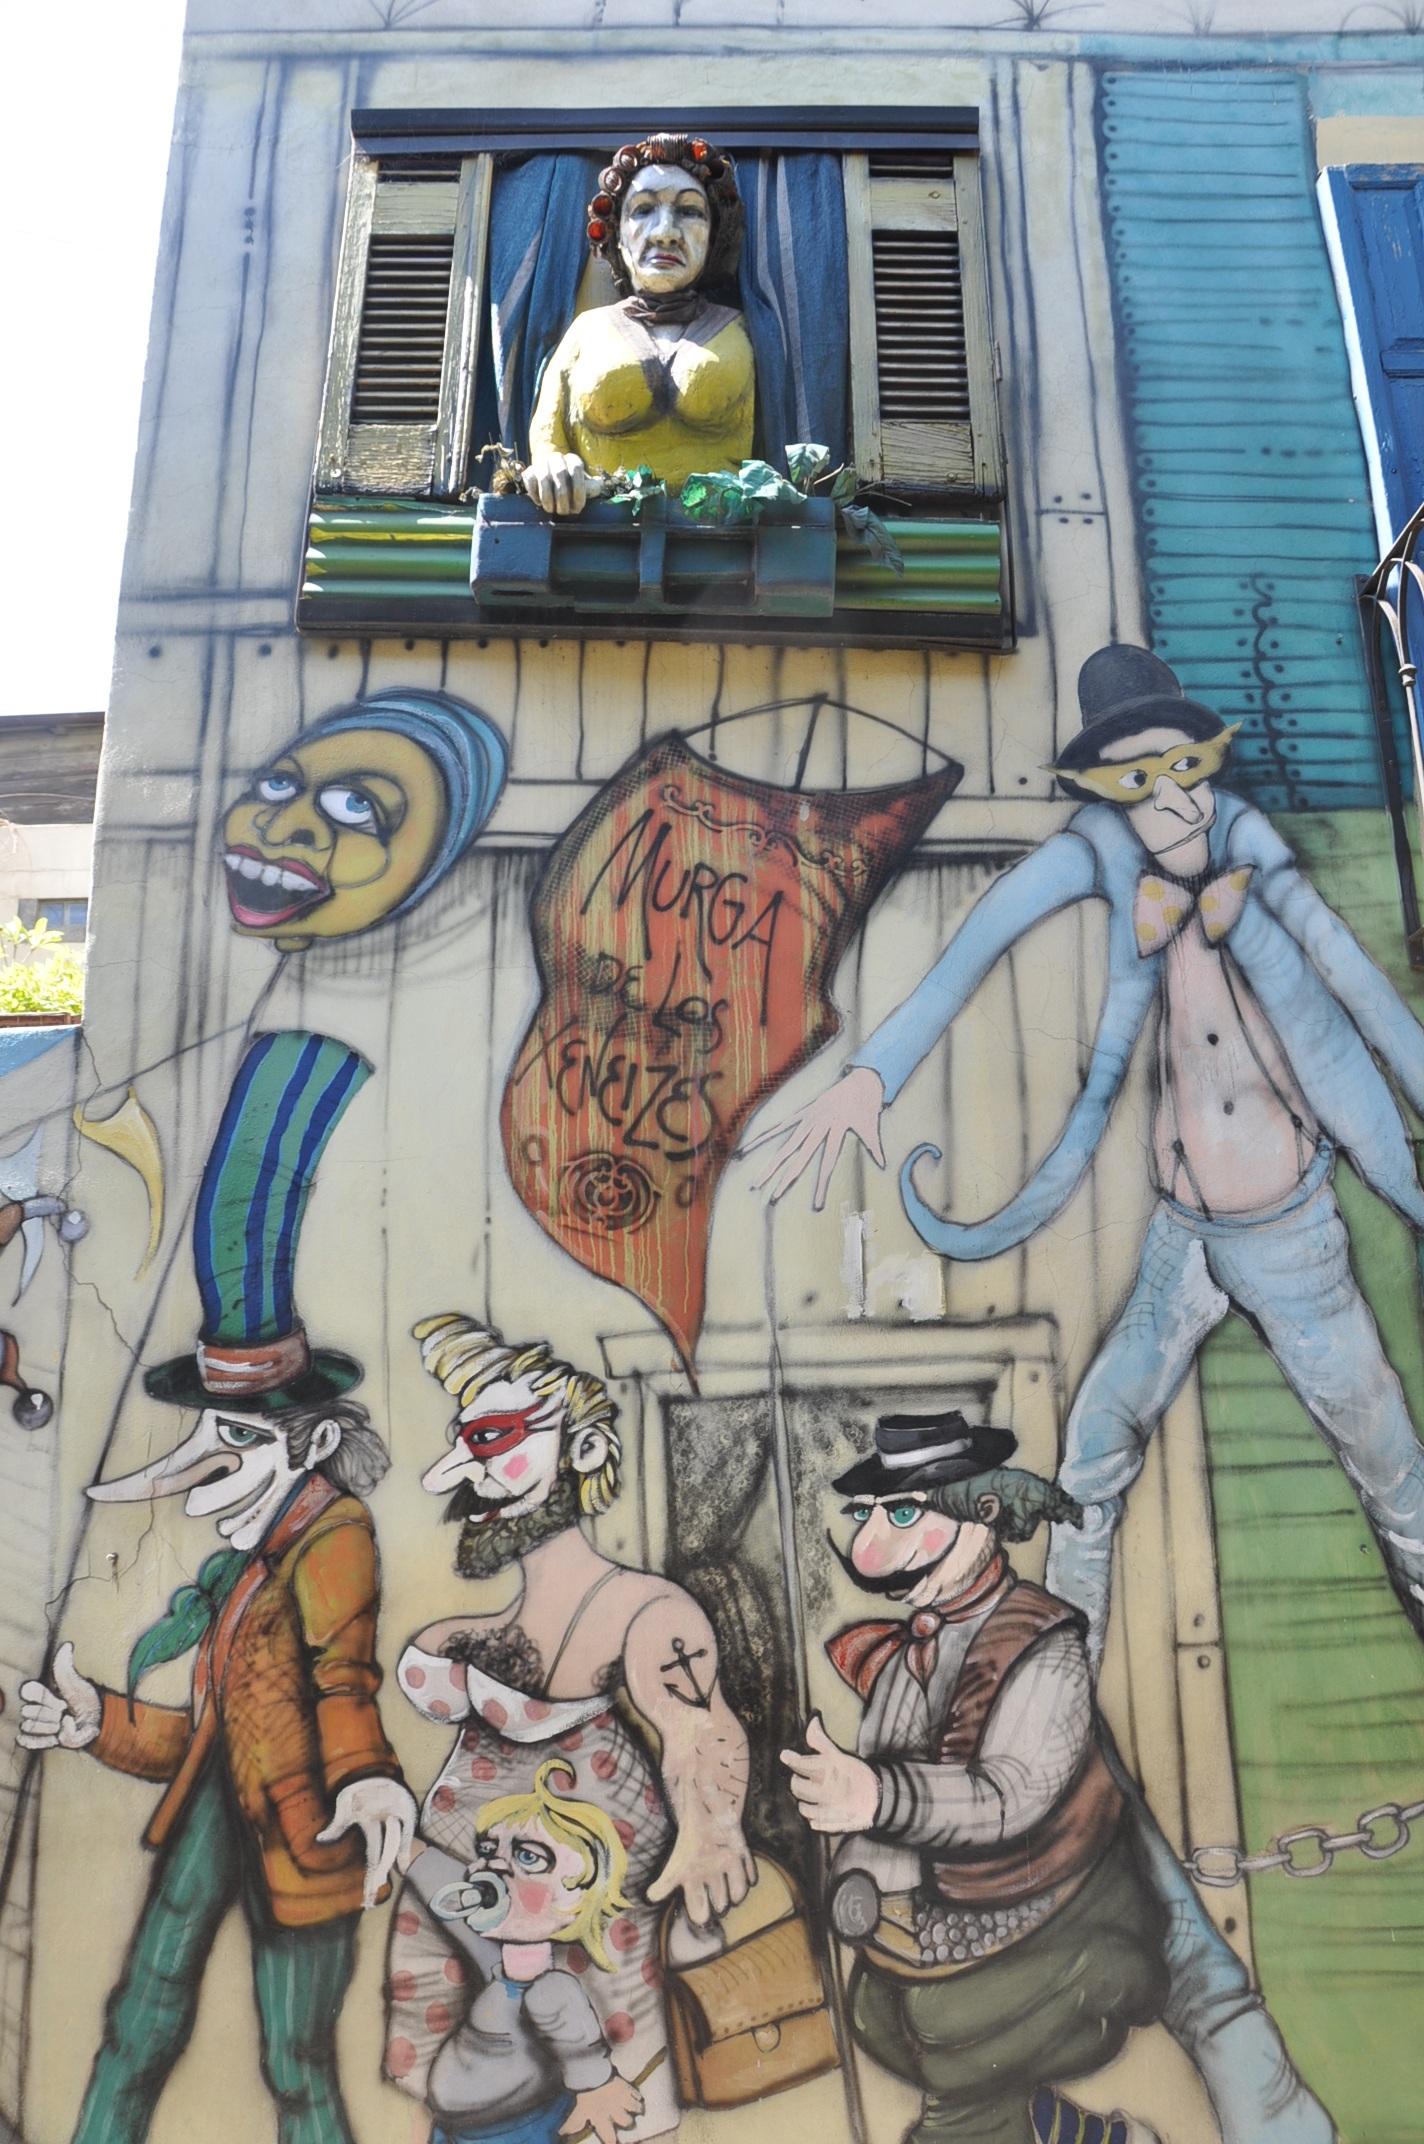 Gambar Orang Orang Jendela Coretan Seni Jalanan Seni Urban